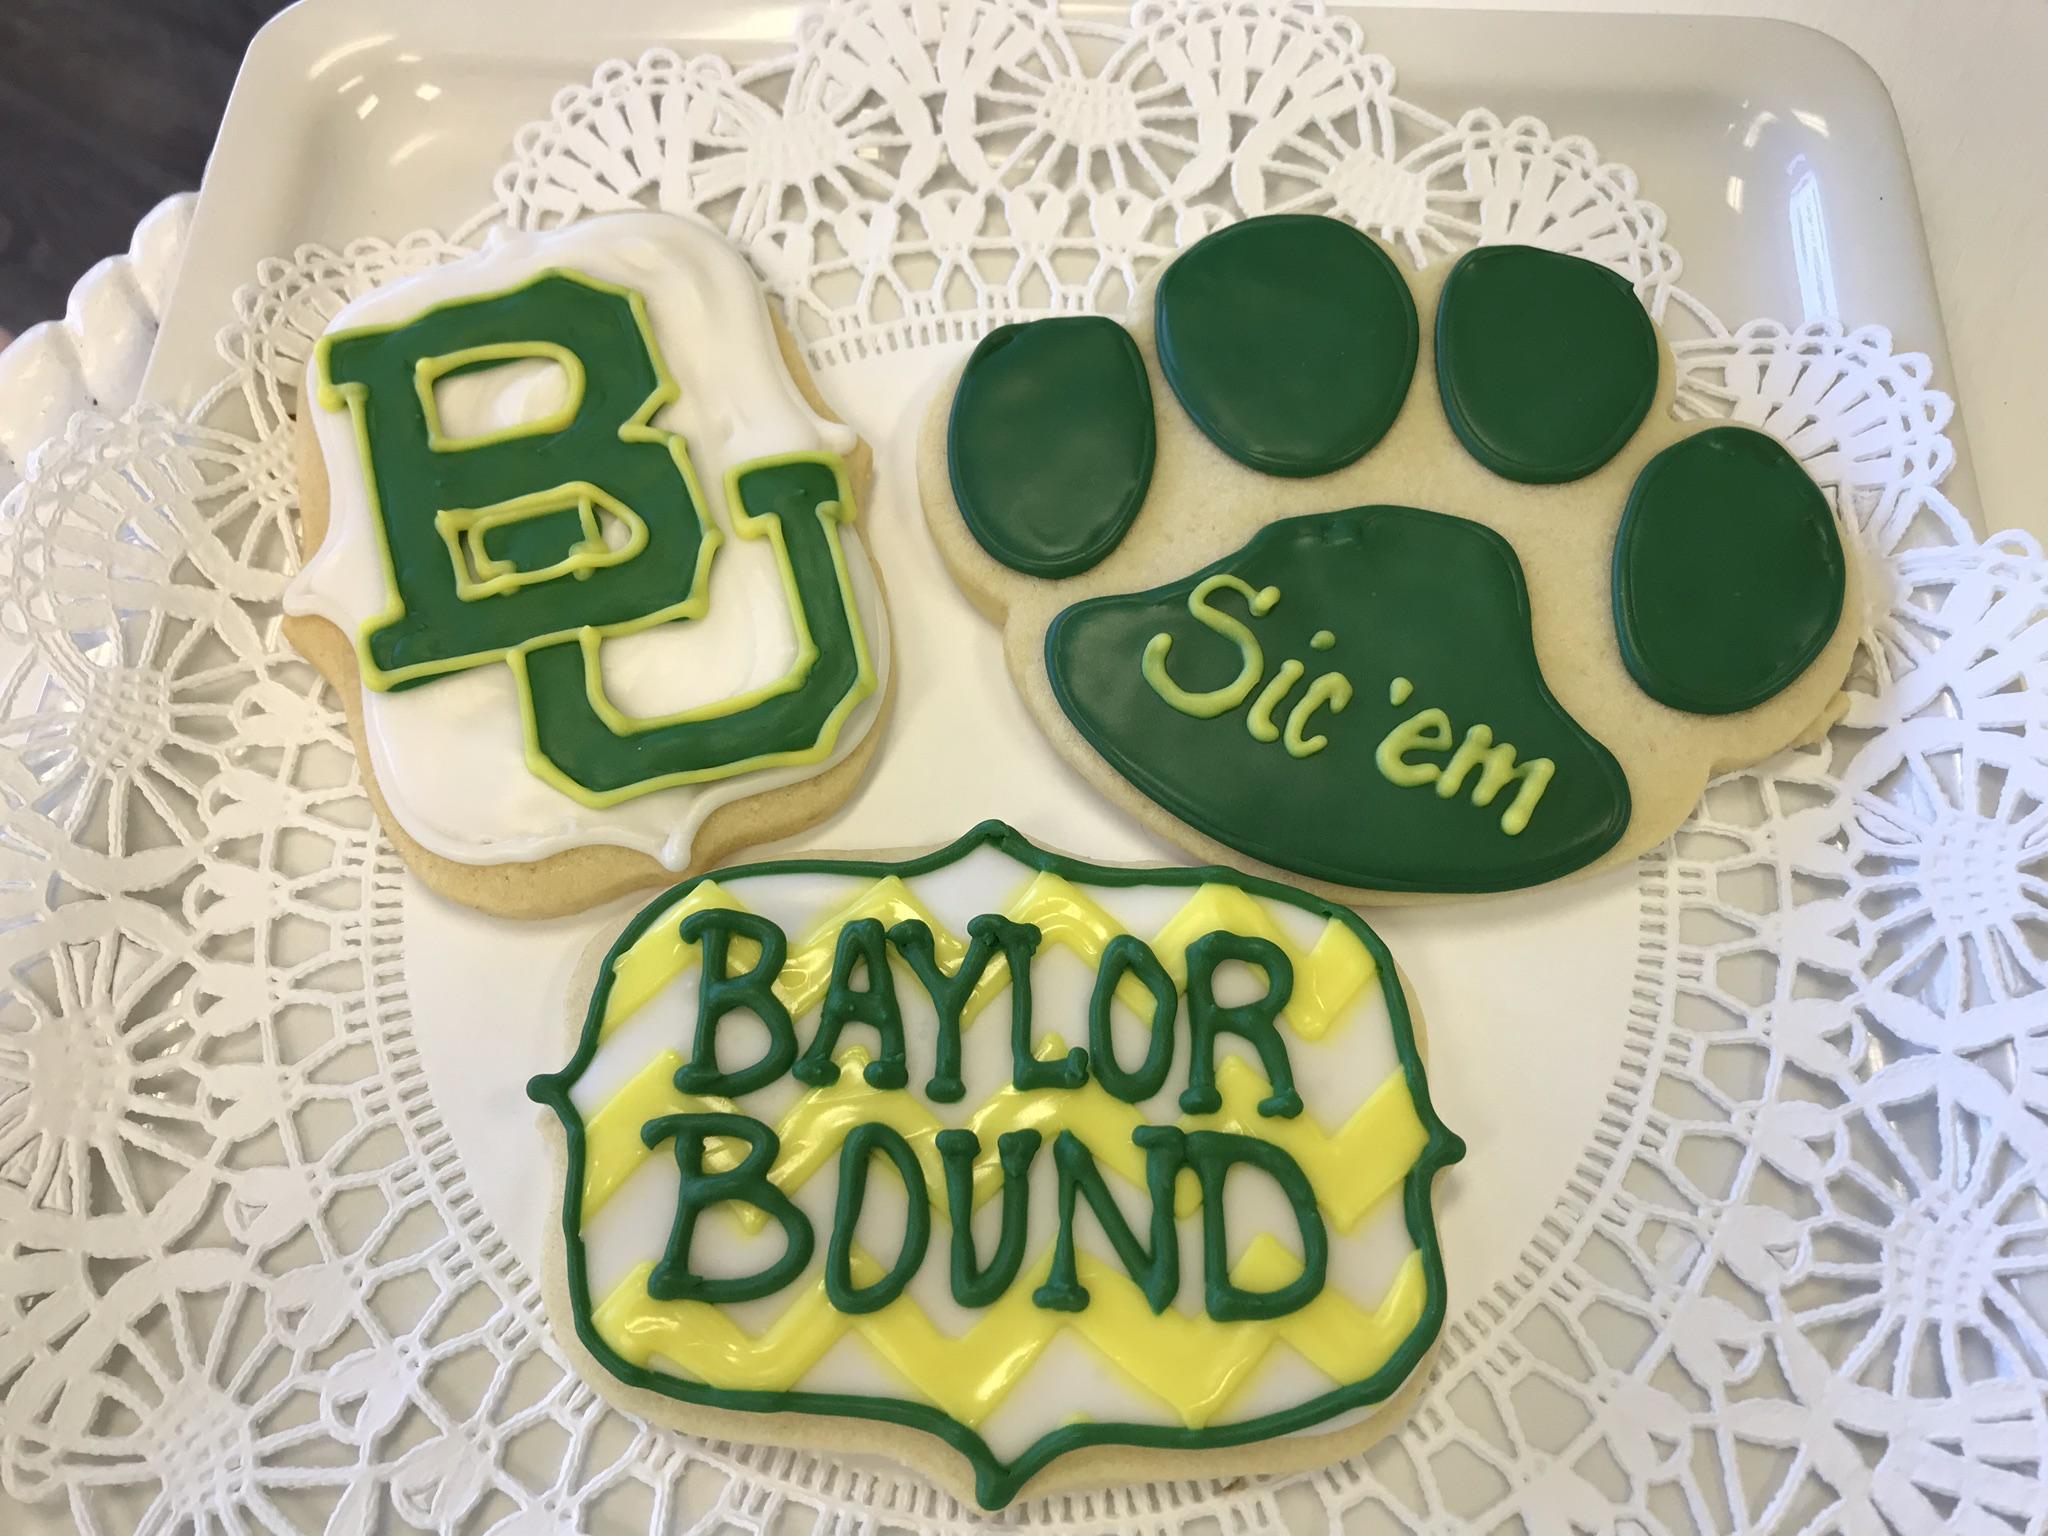 baylor univ grad cookies.jpg